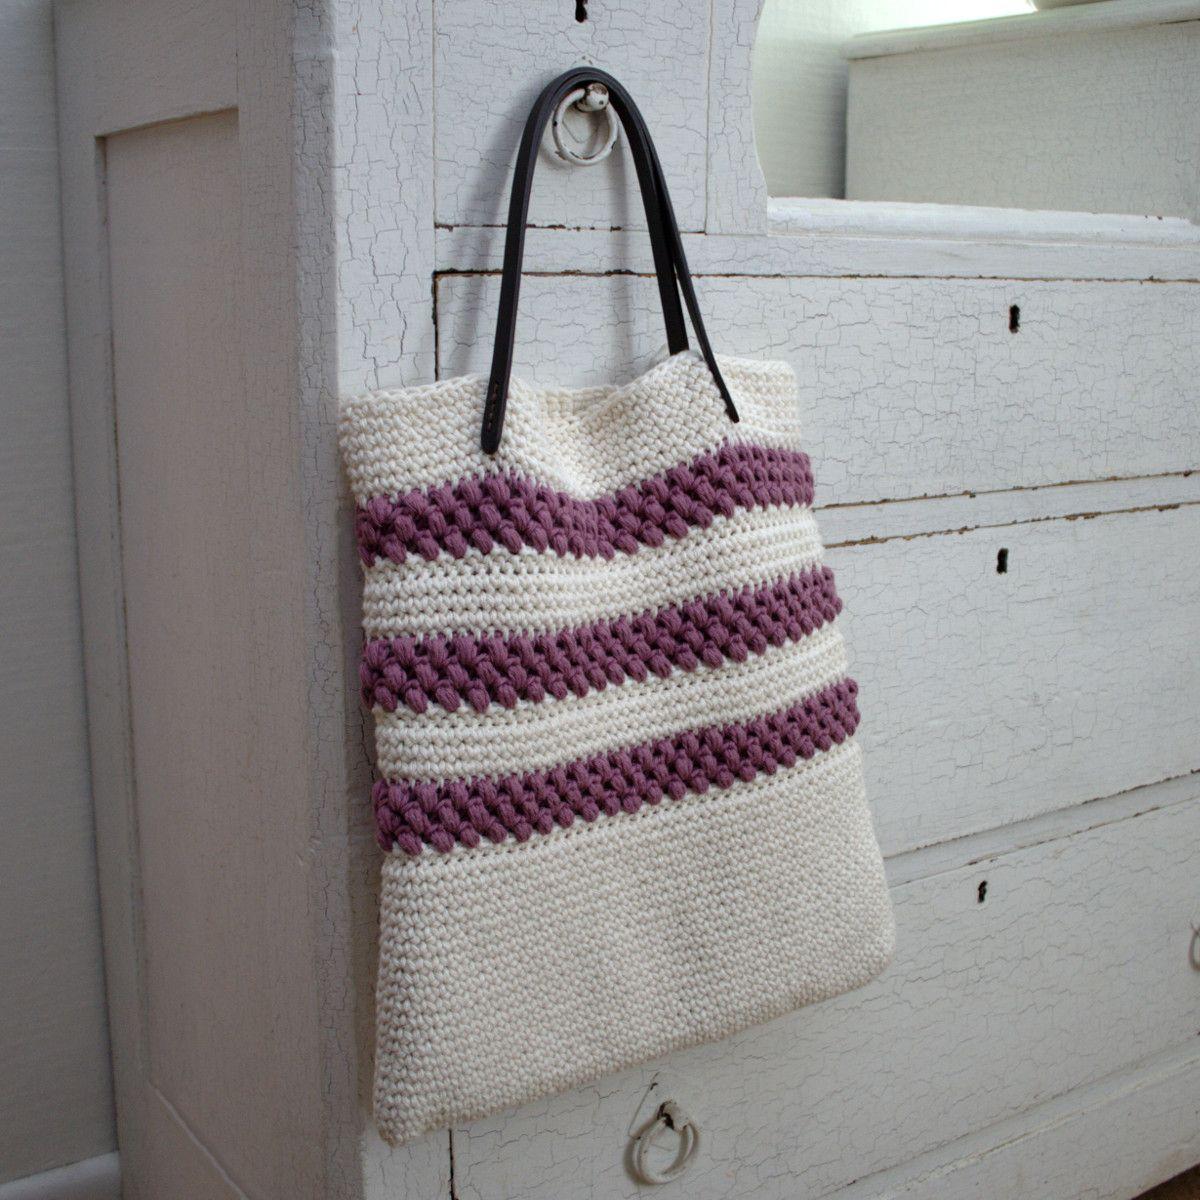 Striped crochet bag hanging on drawer knob